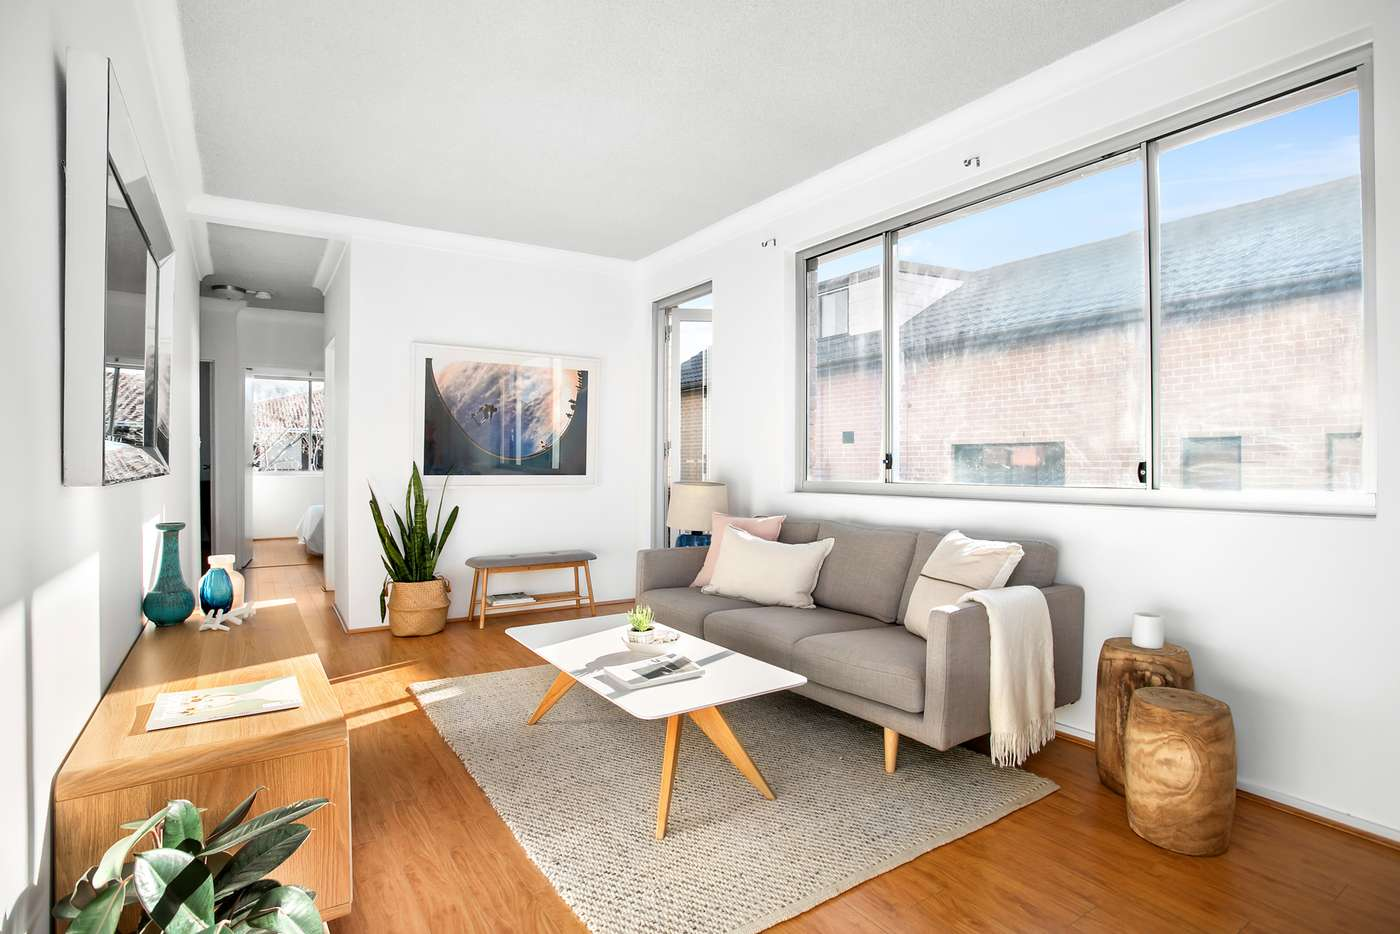 Main view of Homely apartment listing, 6/30 Beach Road, Bondi Beach NSW 2026